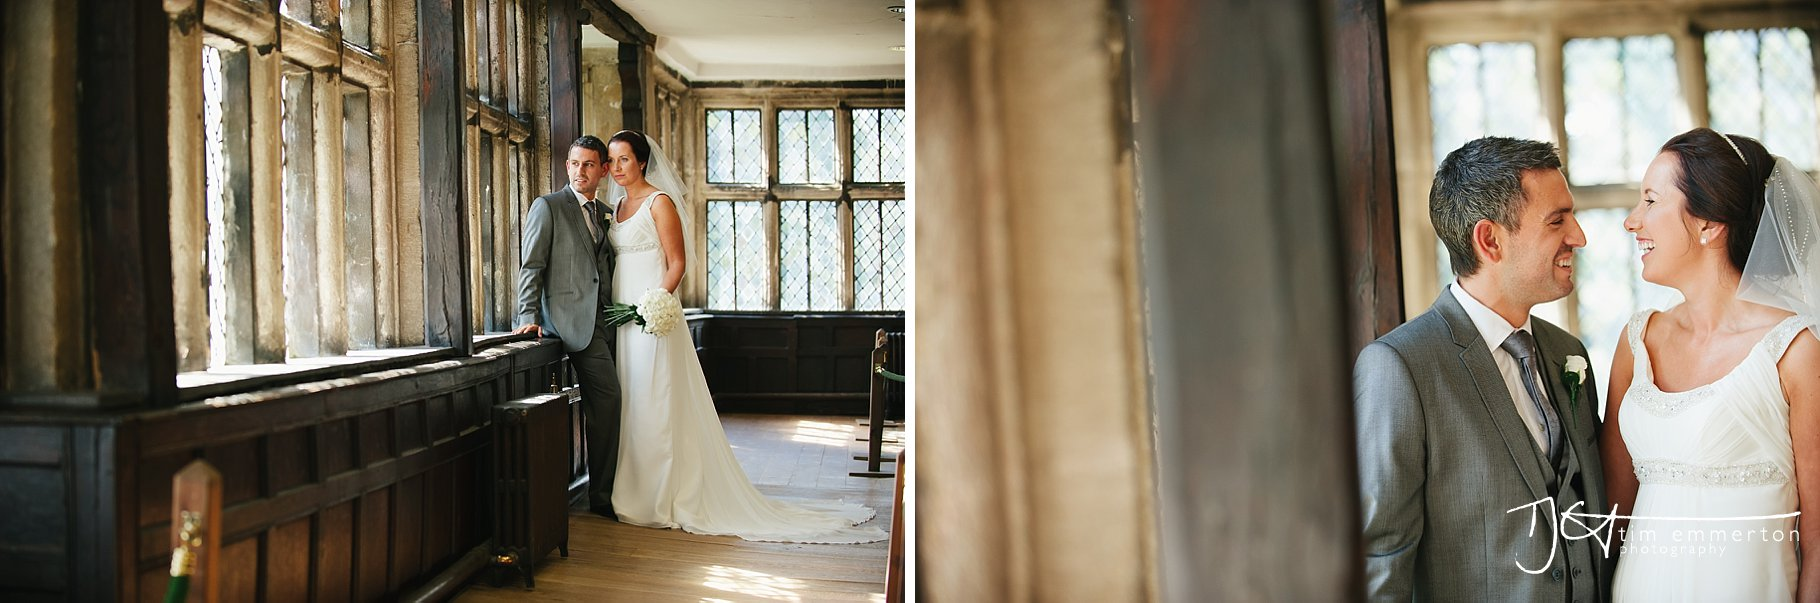 Northcote-Wedding-Photos-125.jpg